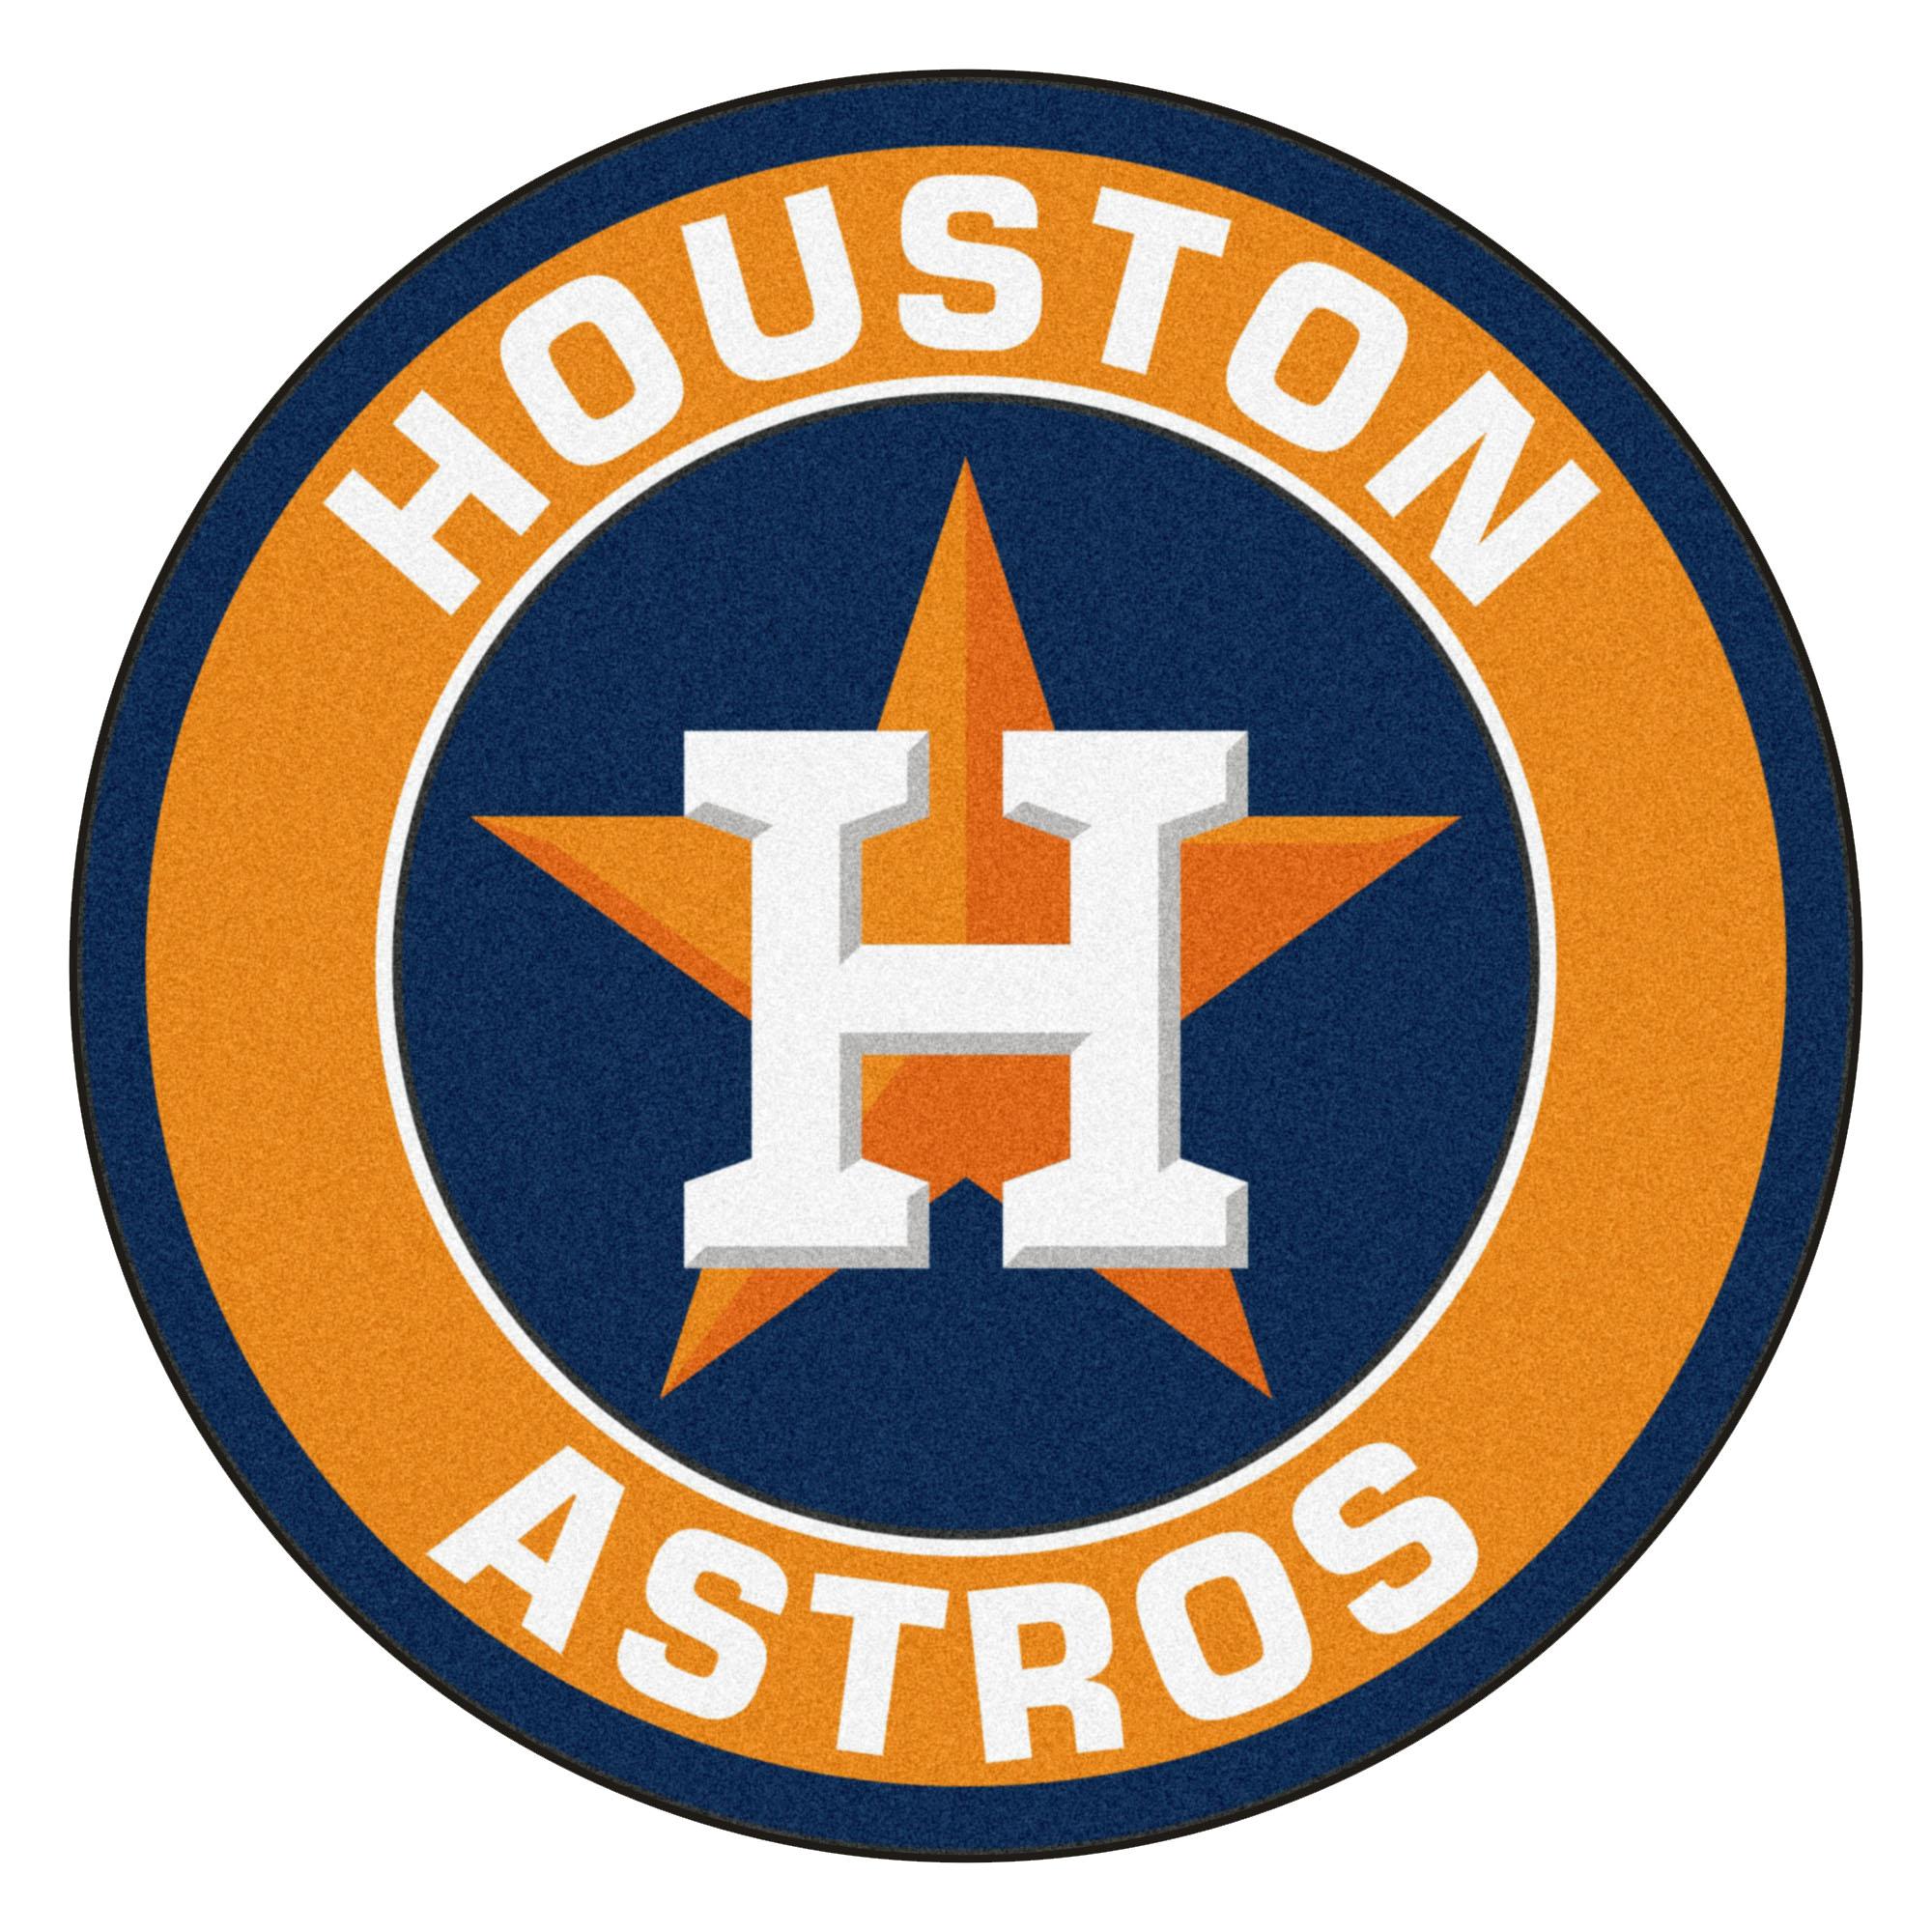 Image result for houston astros logo